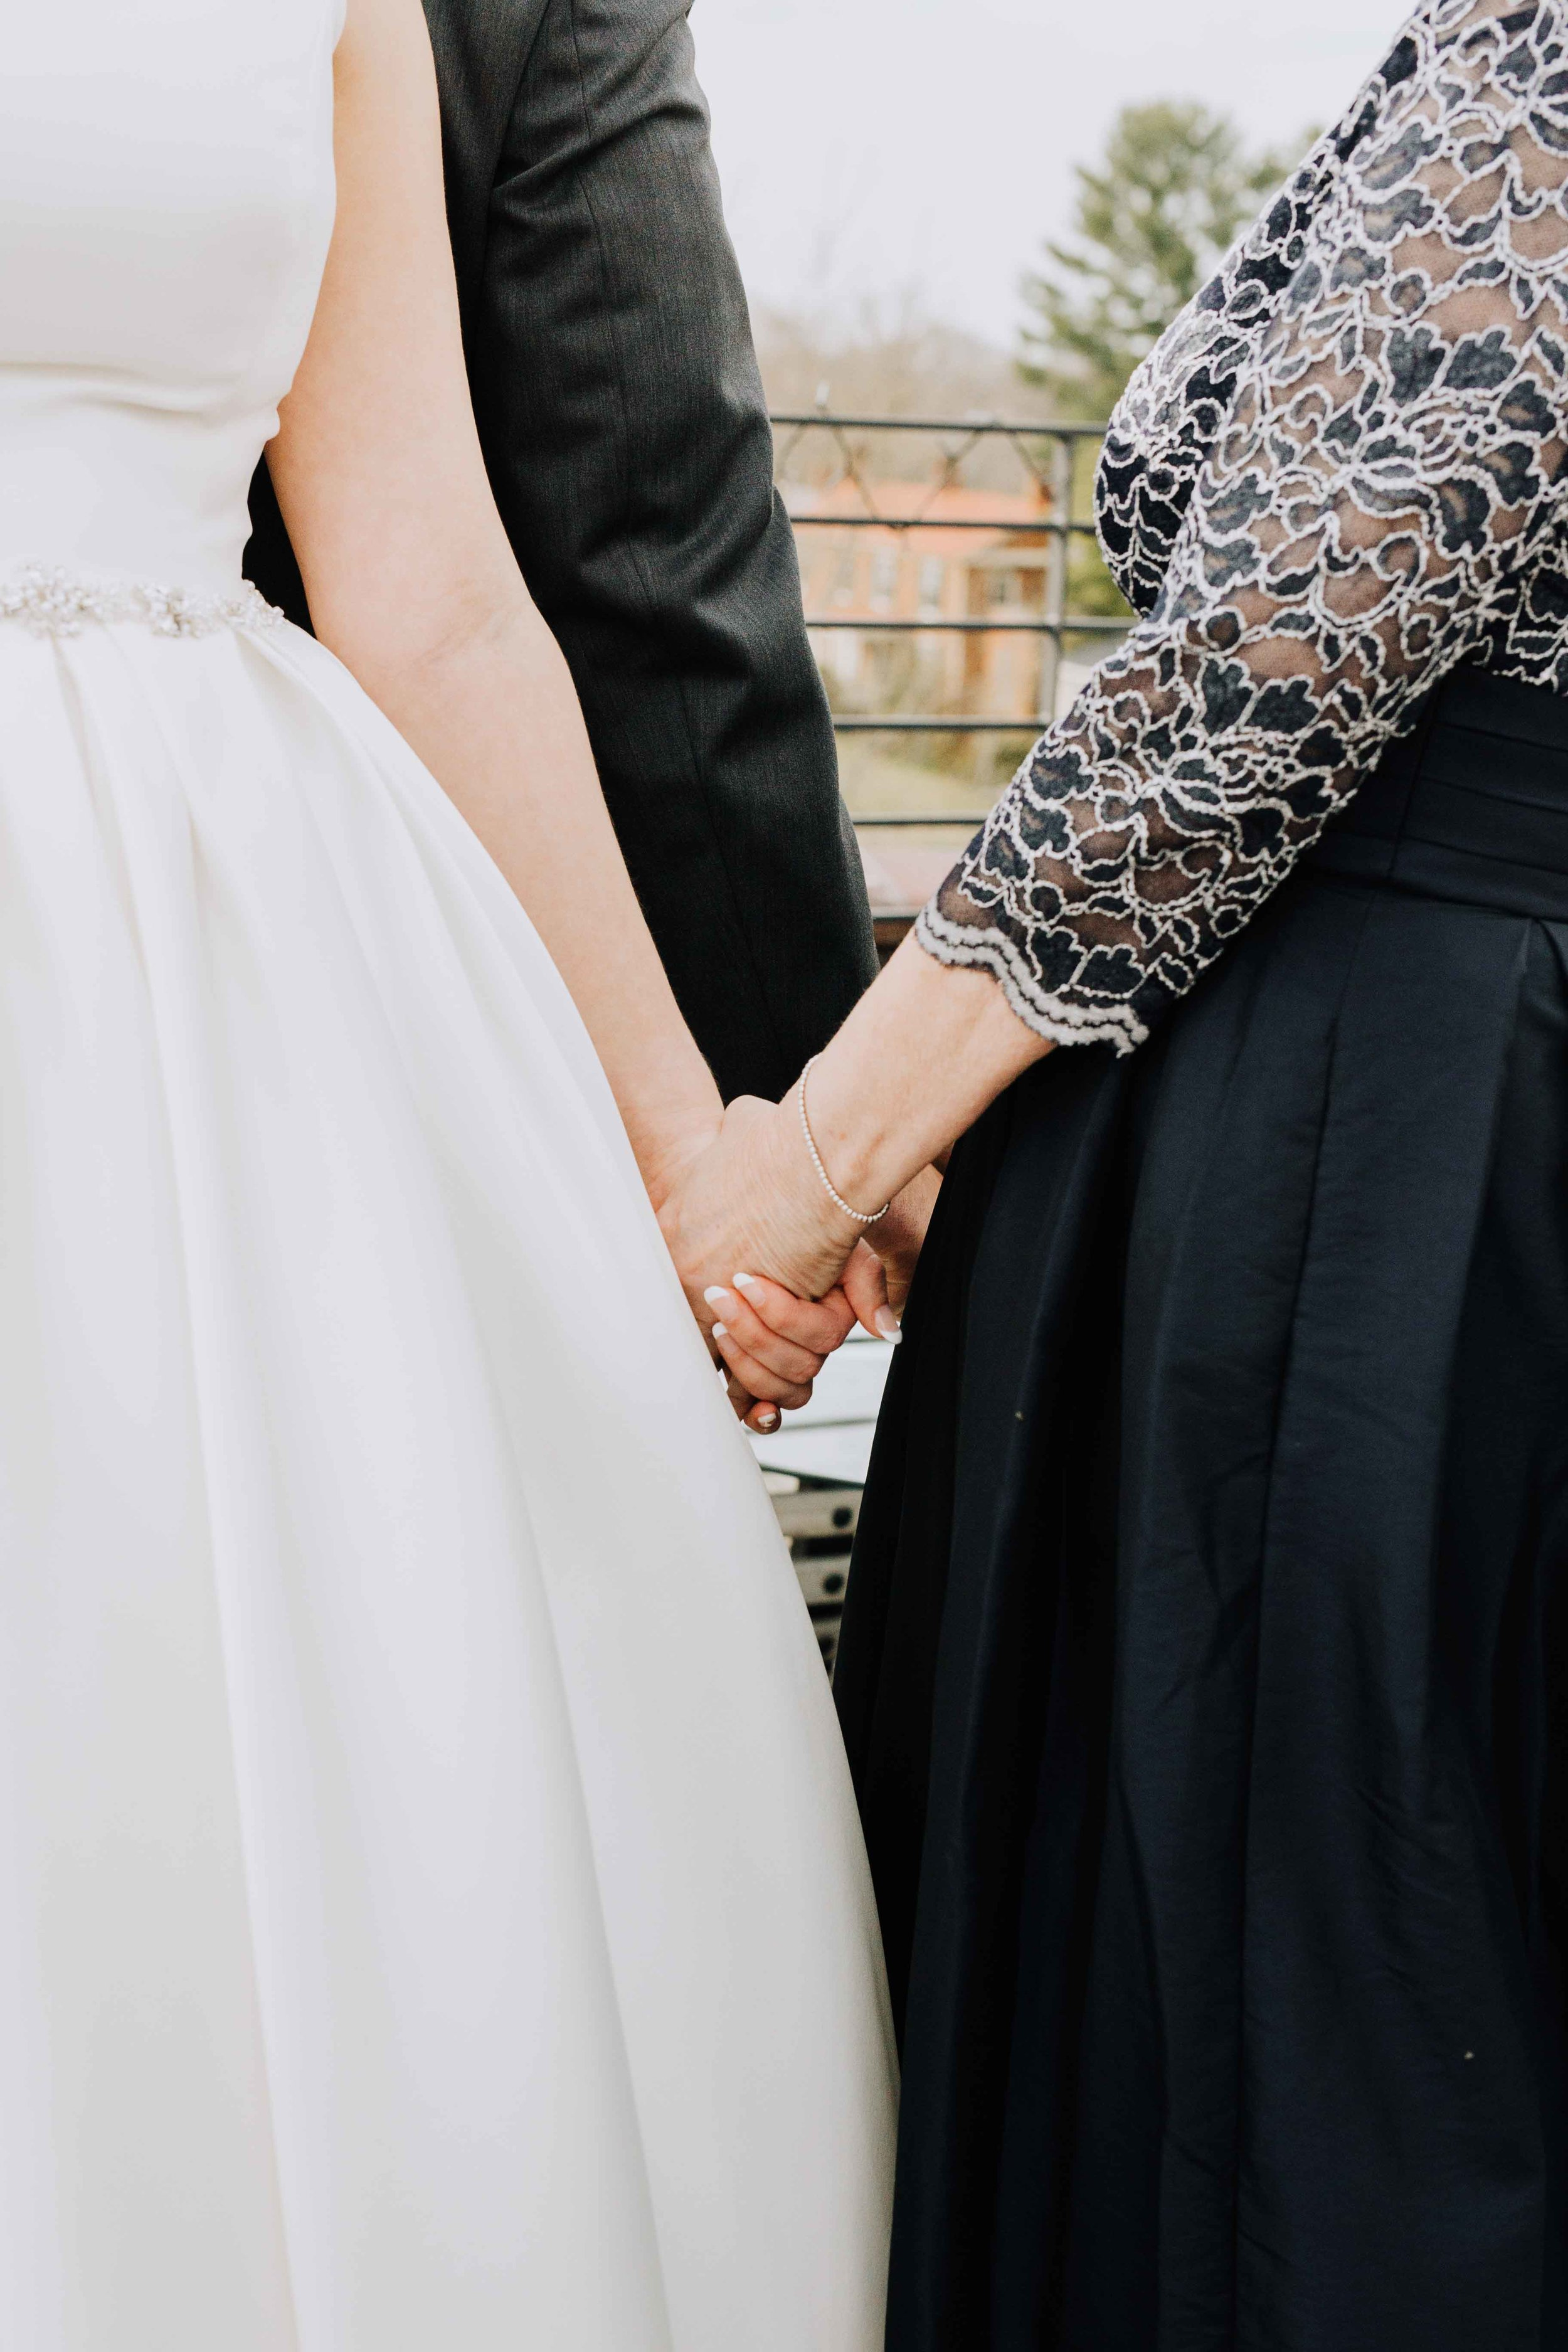 Farmville-Virginia-Wedding-Hotel-Weynoke-Downtown-Jacqueline-Waters-Photography-Detailed- (579).jpg